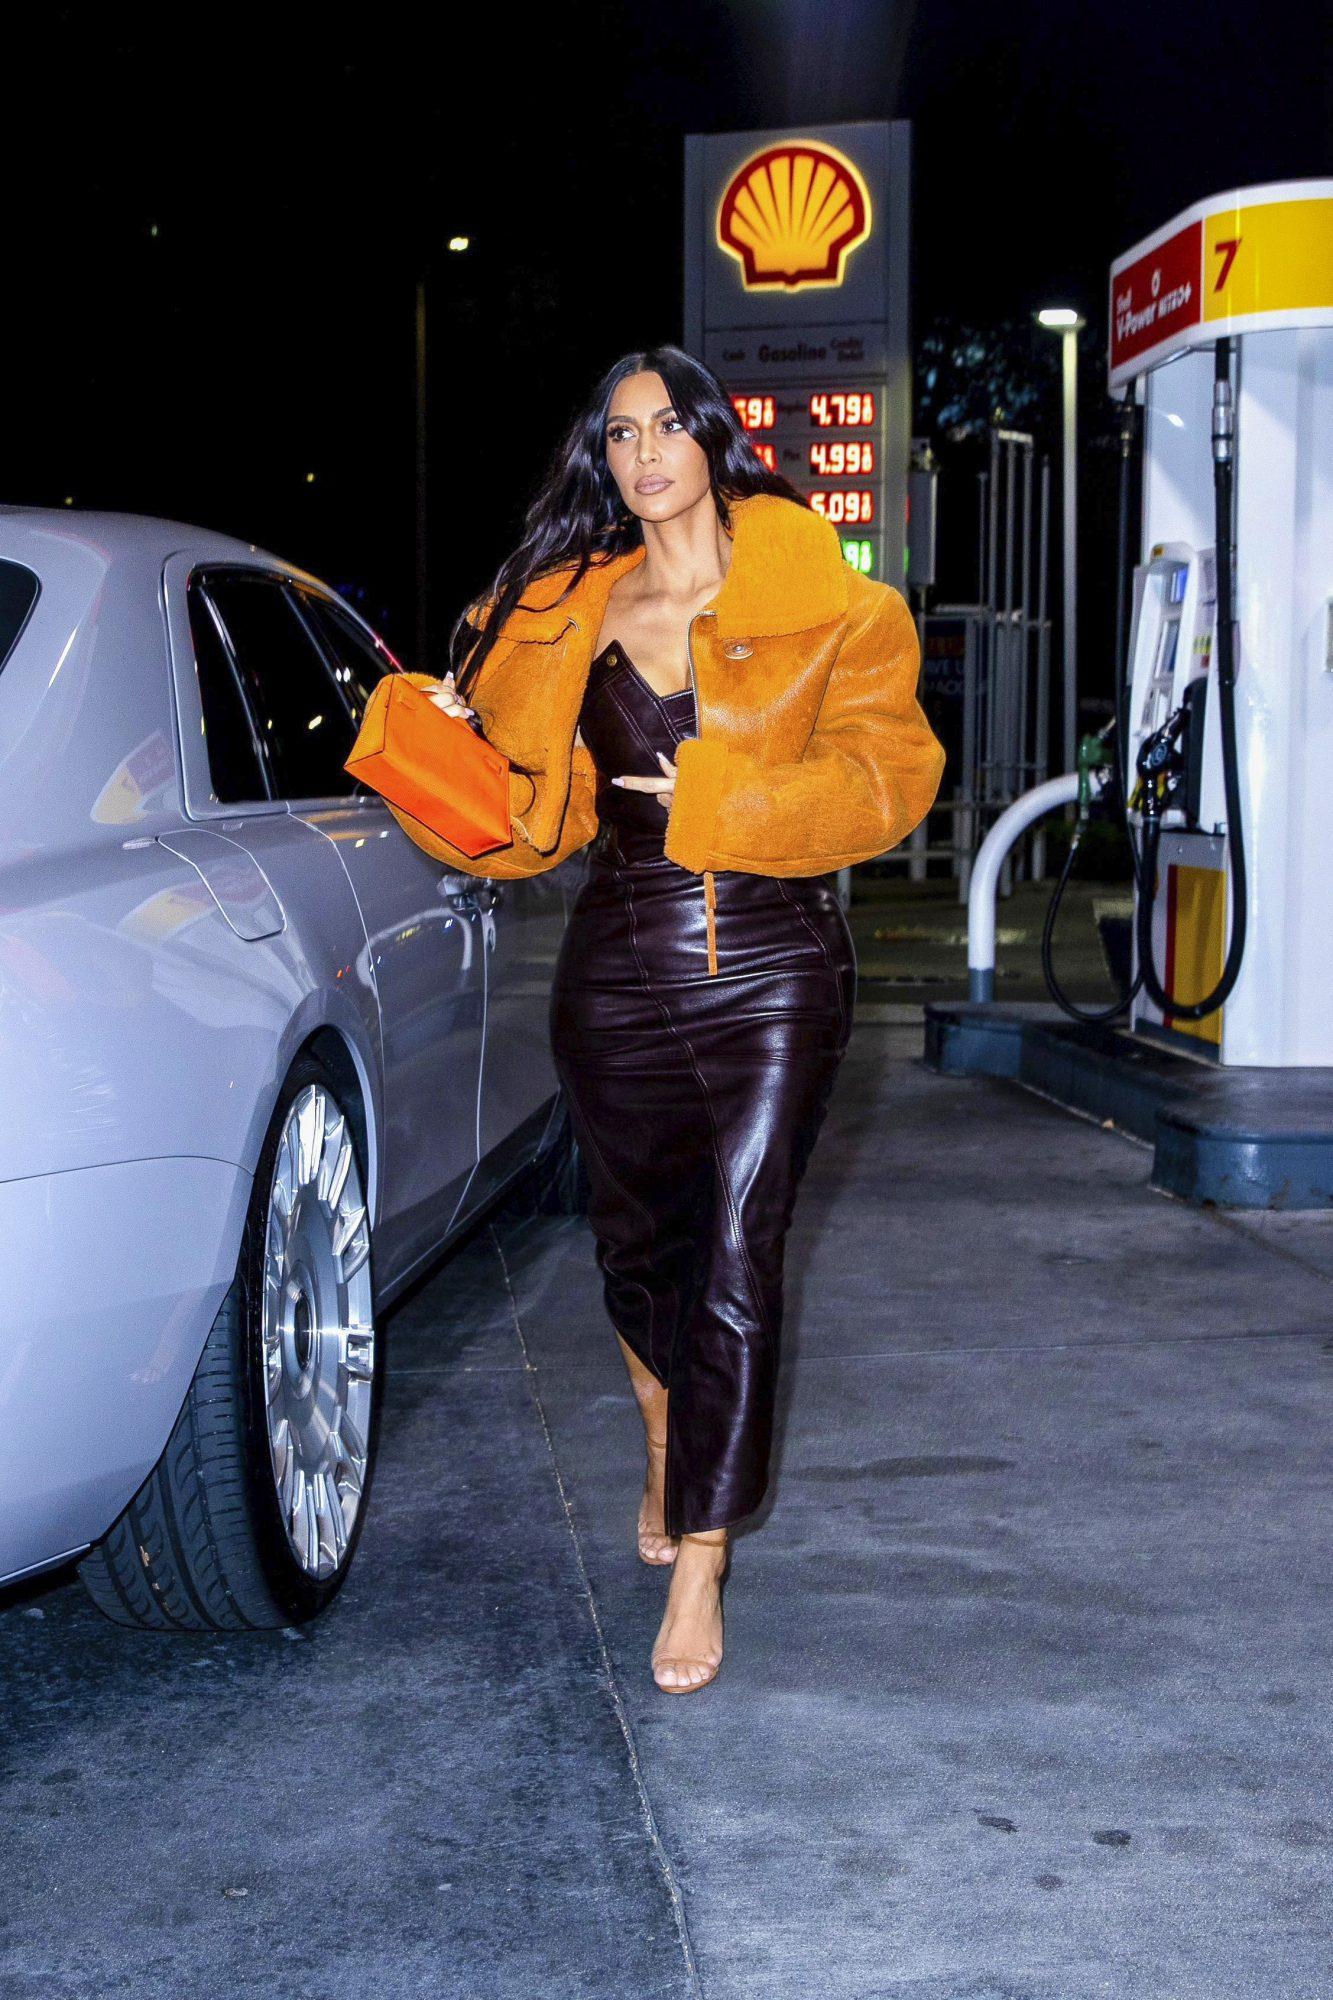 Kim Kardashian Makes a Snack Run in a Dior Dress & YEEZY Jacket Fashioned by Ex